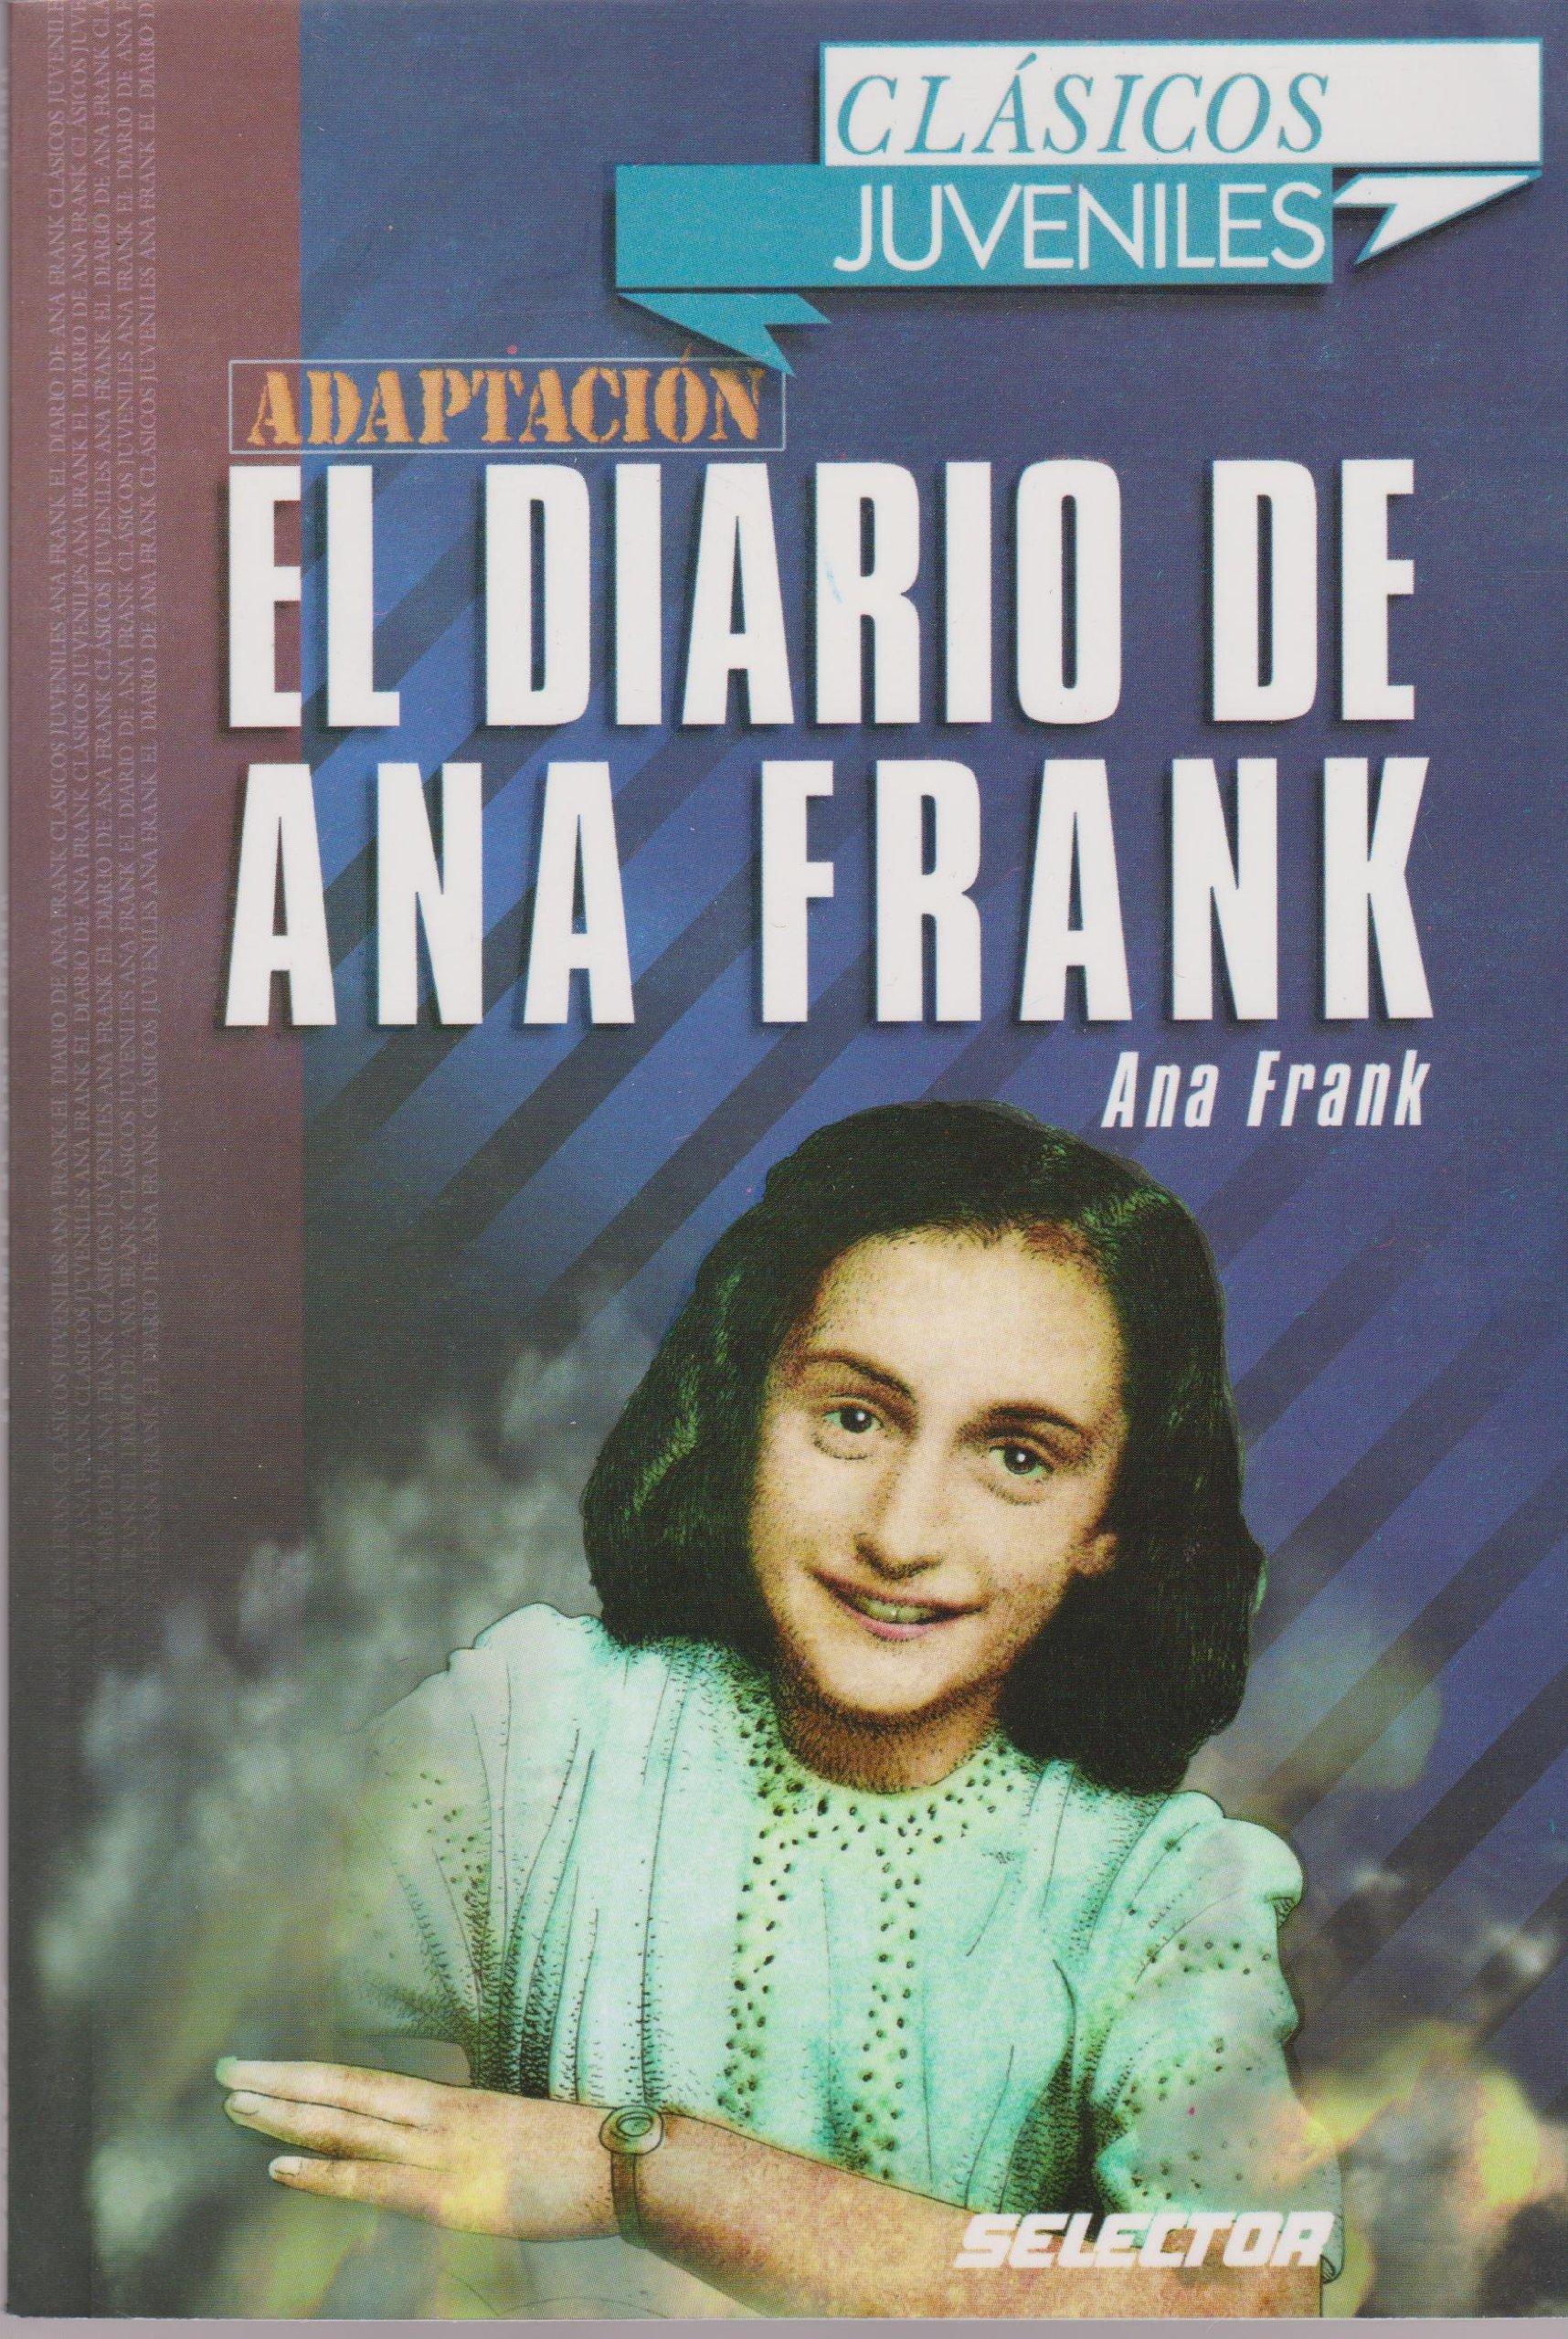 El diario de ana frank (CLÁSICOS PARA NIÑOS) (Spanish Edition): Ana Frank: 9789706439345: Amazon.com: Books